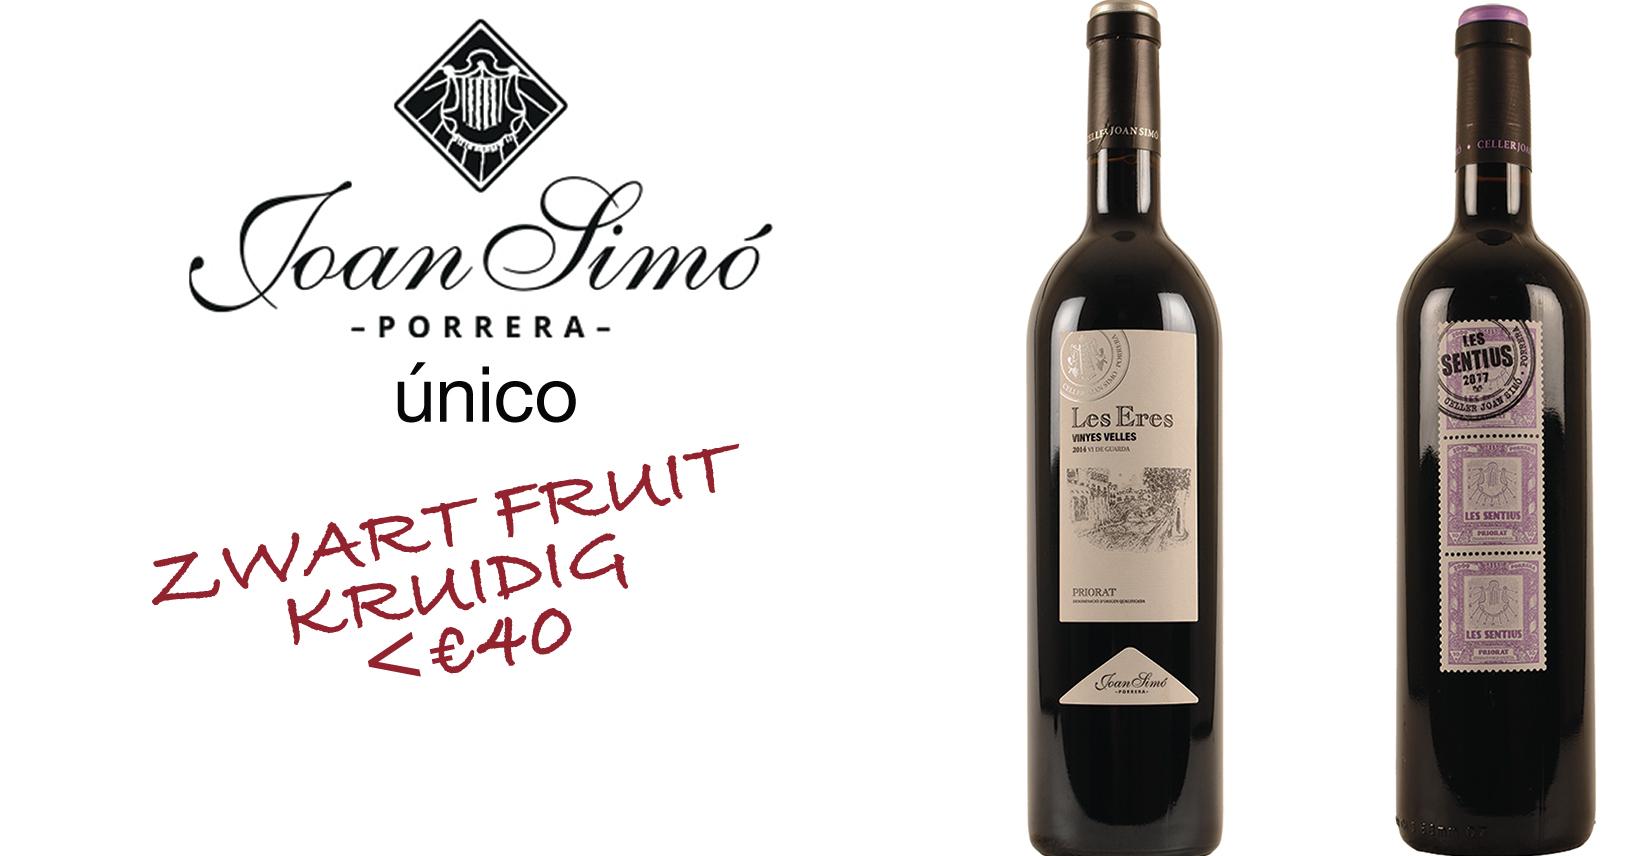 Priorat Joan Simo wijn promo